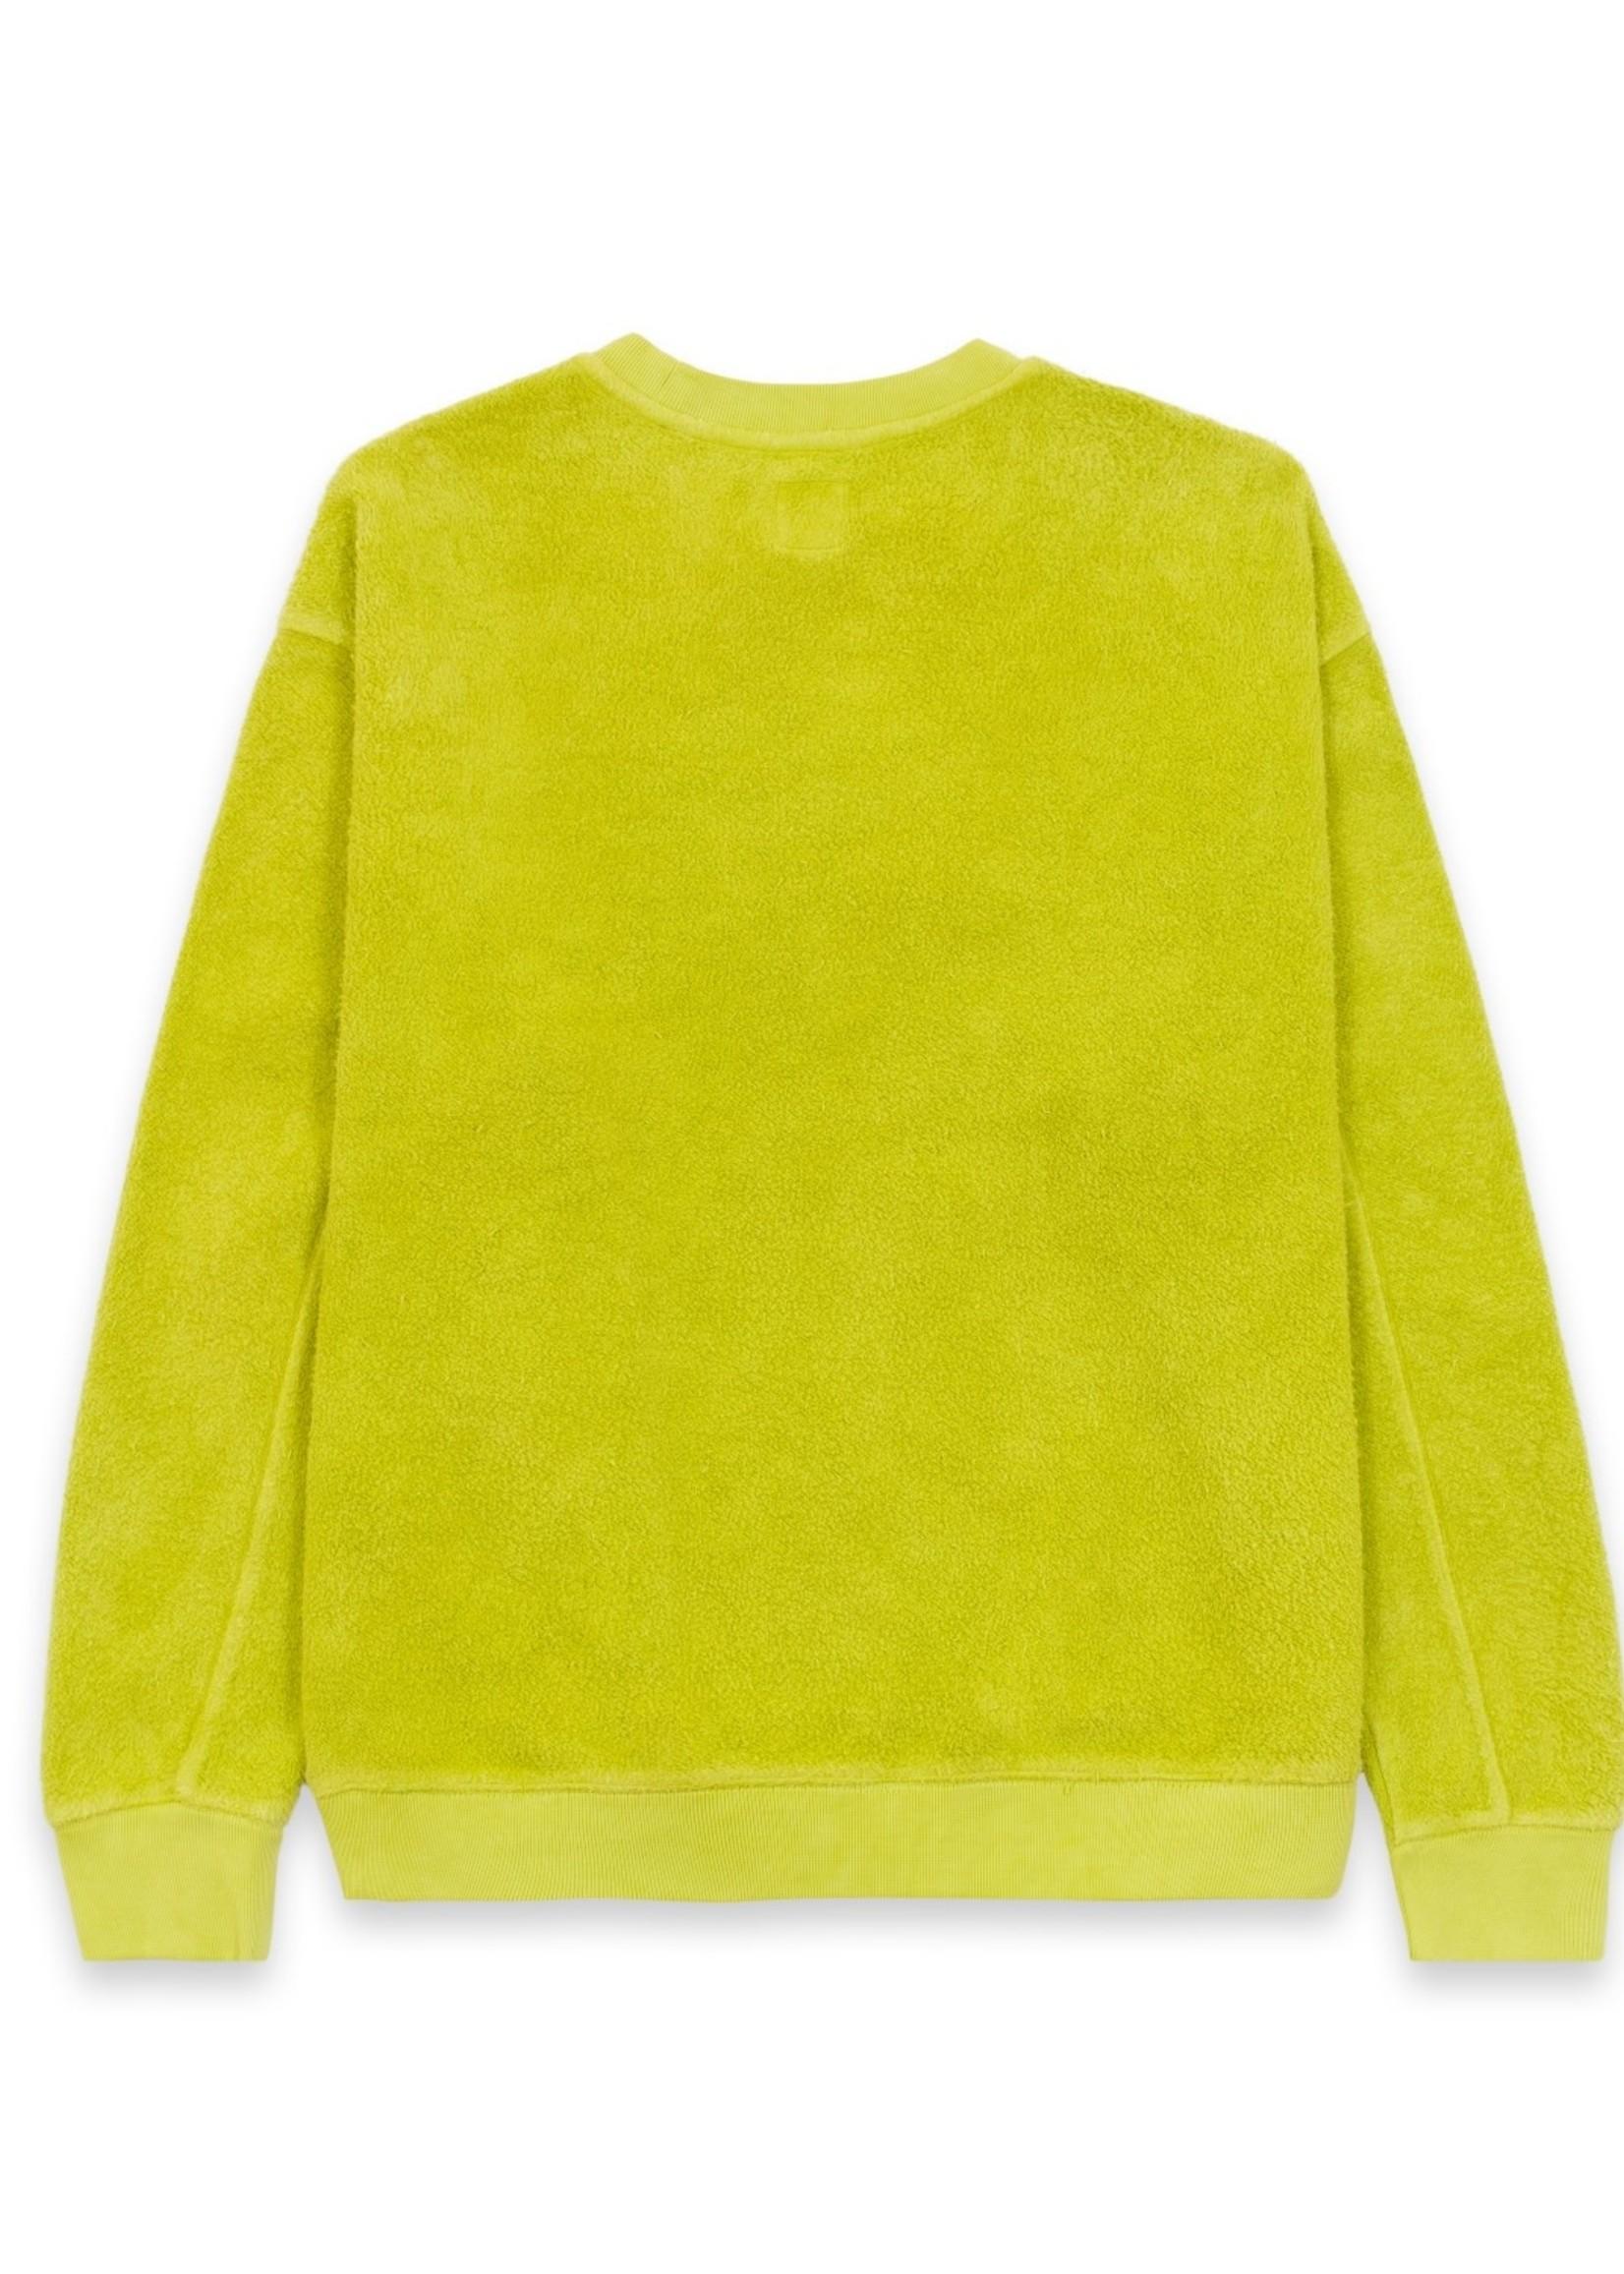 Brain Dead Slime Reversed Fleece Crewneck Sweatshirt in  Apple